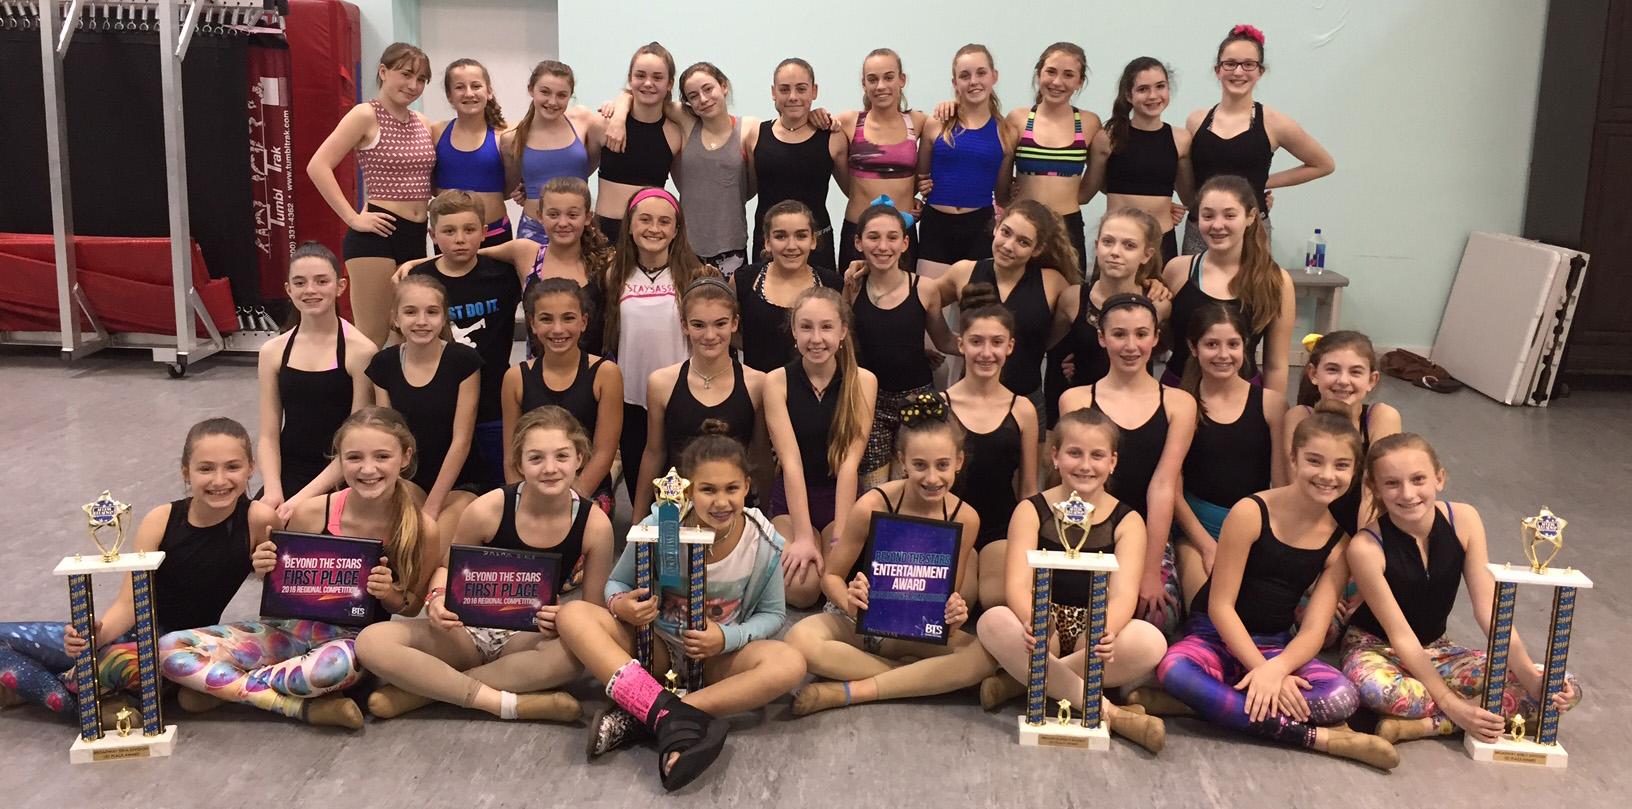 Kick Dance competition